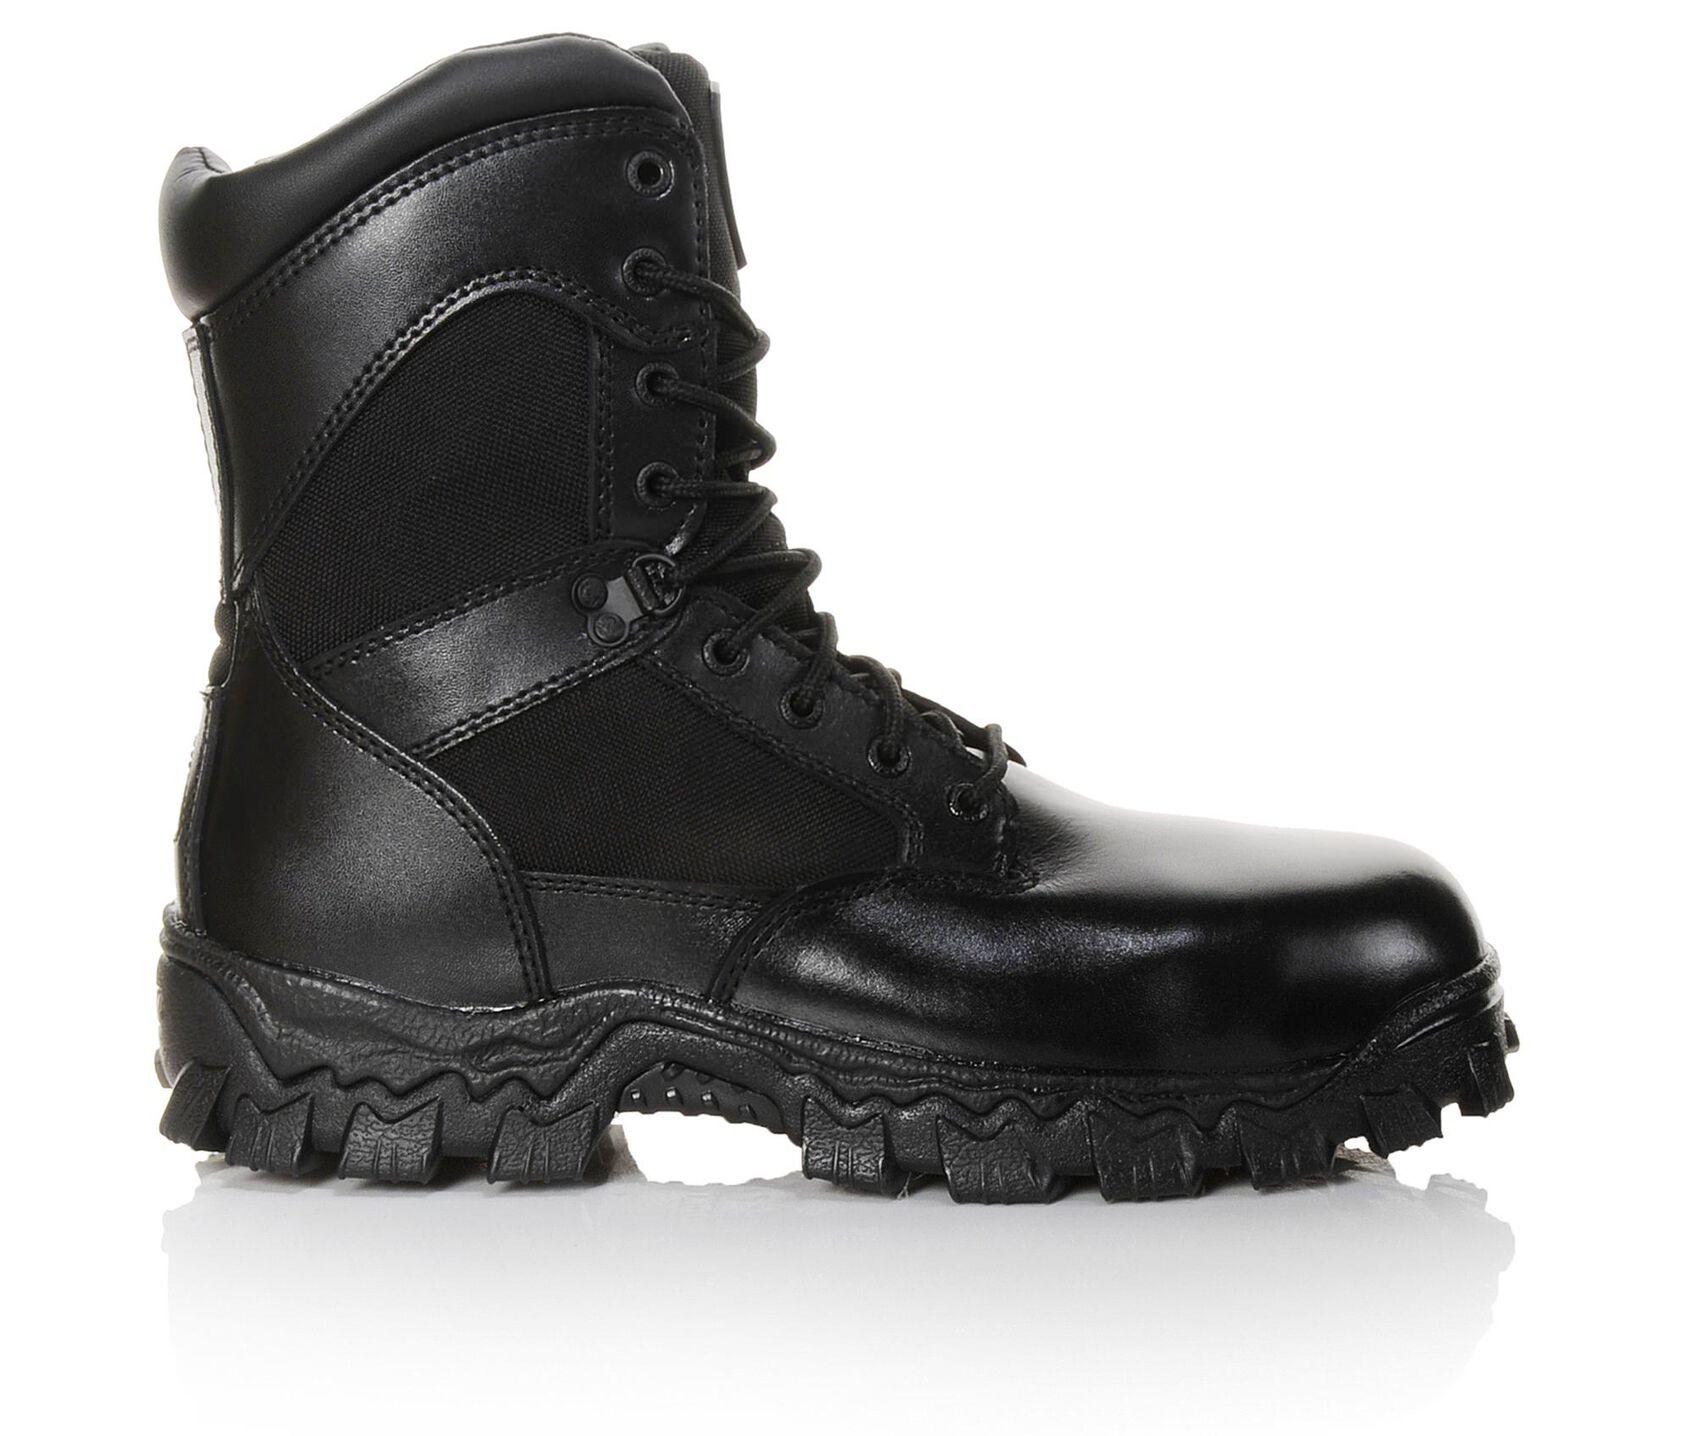 41b12397ec7 Men's Rocky 6173 Alpha Force Insulated Boots